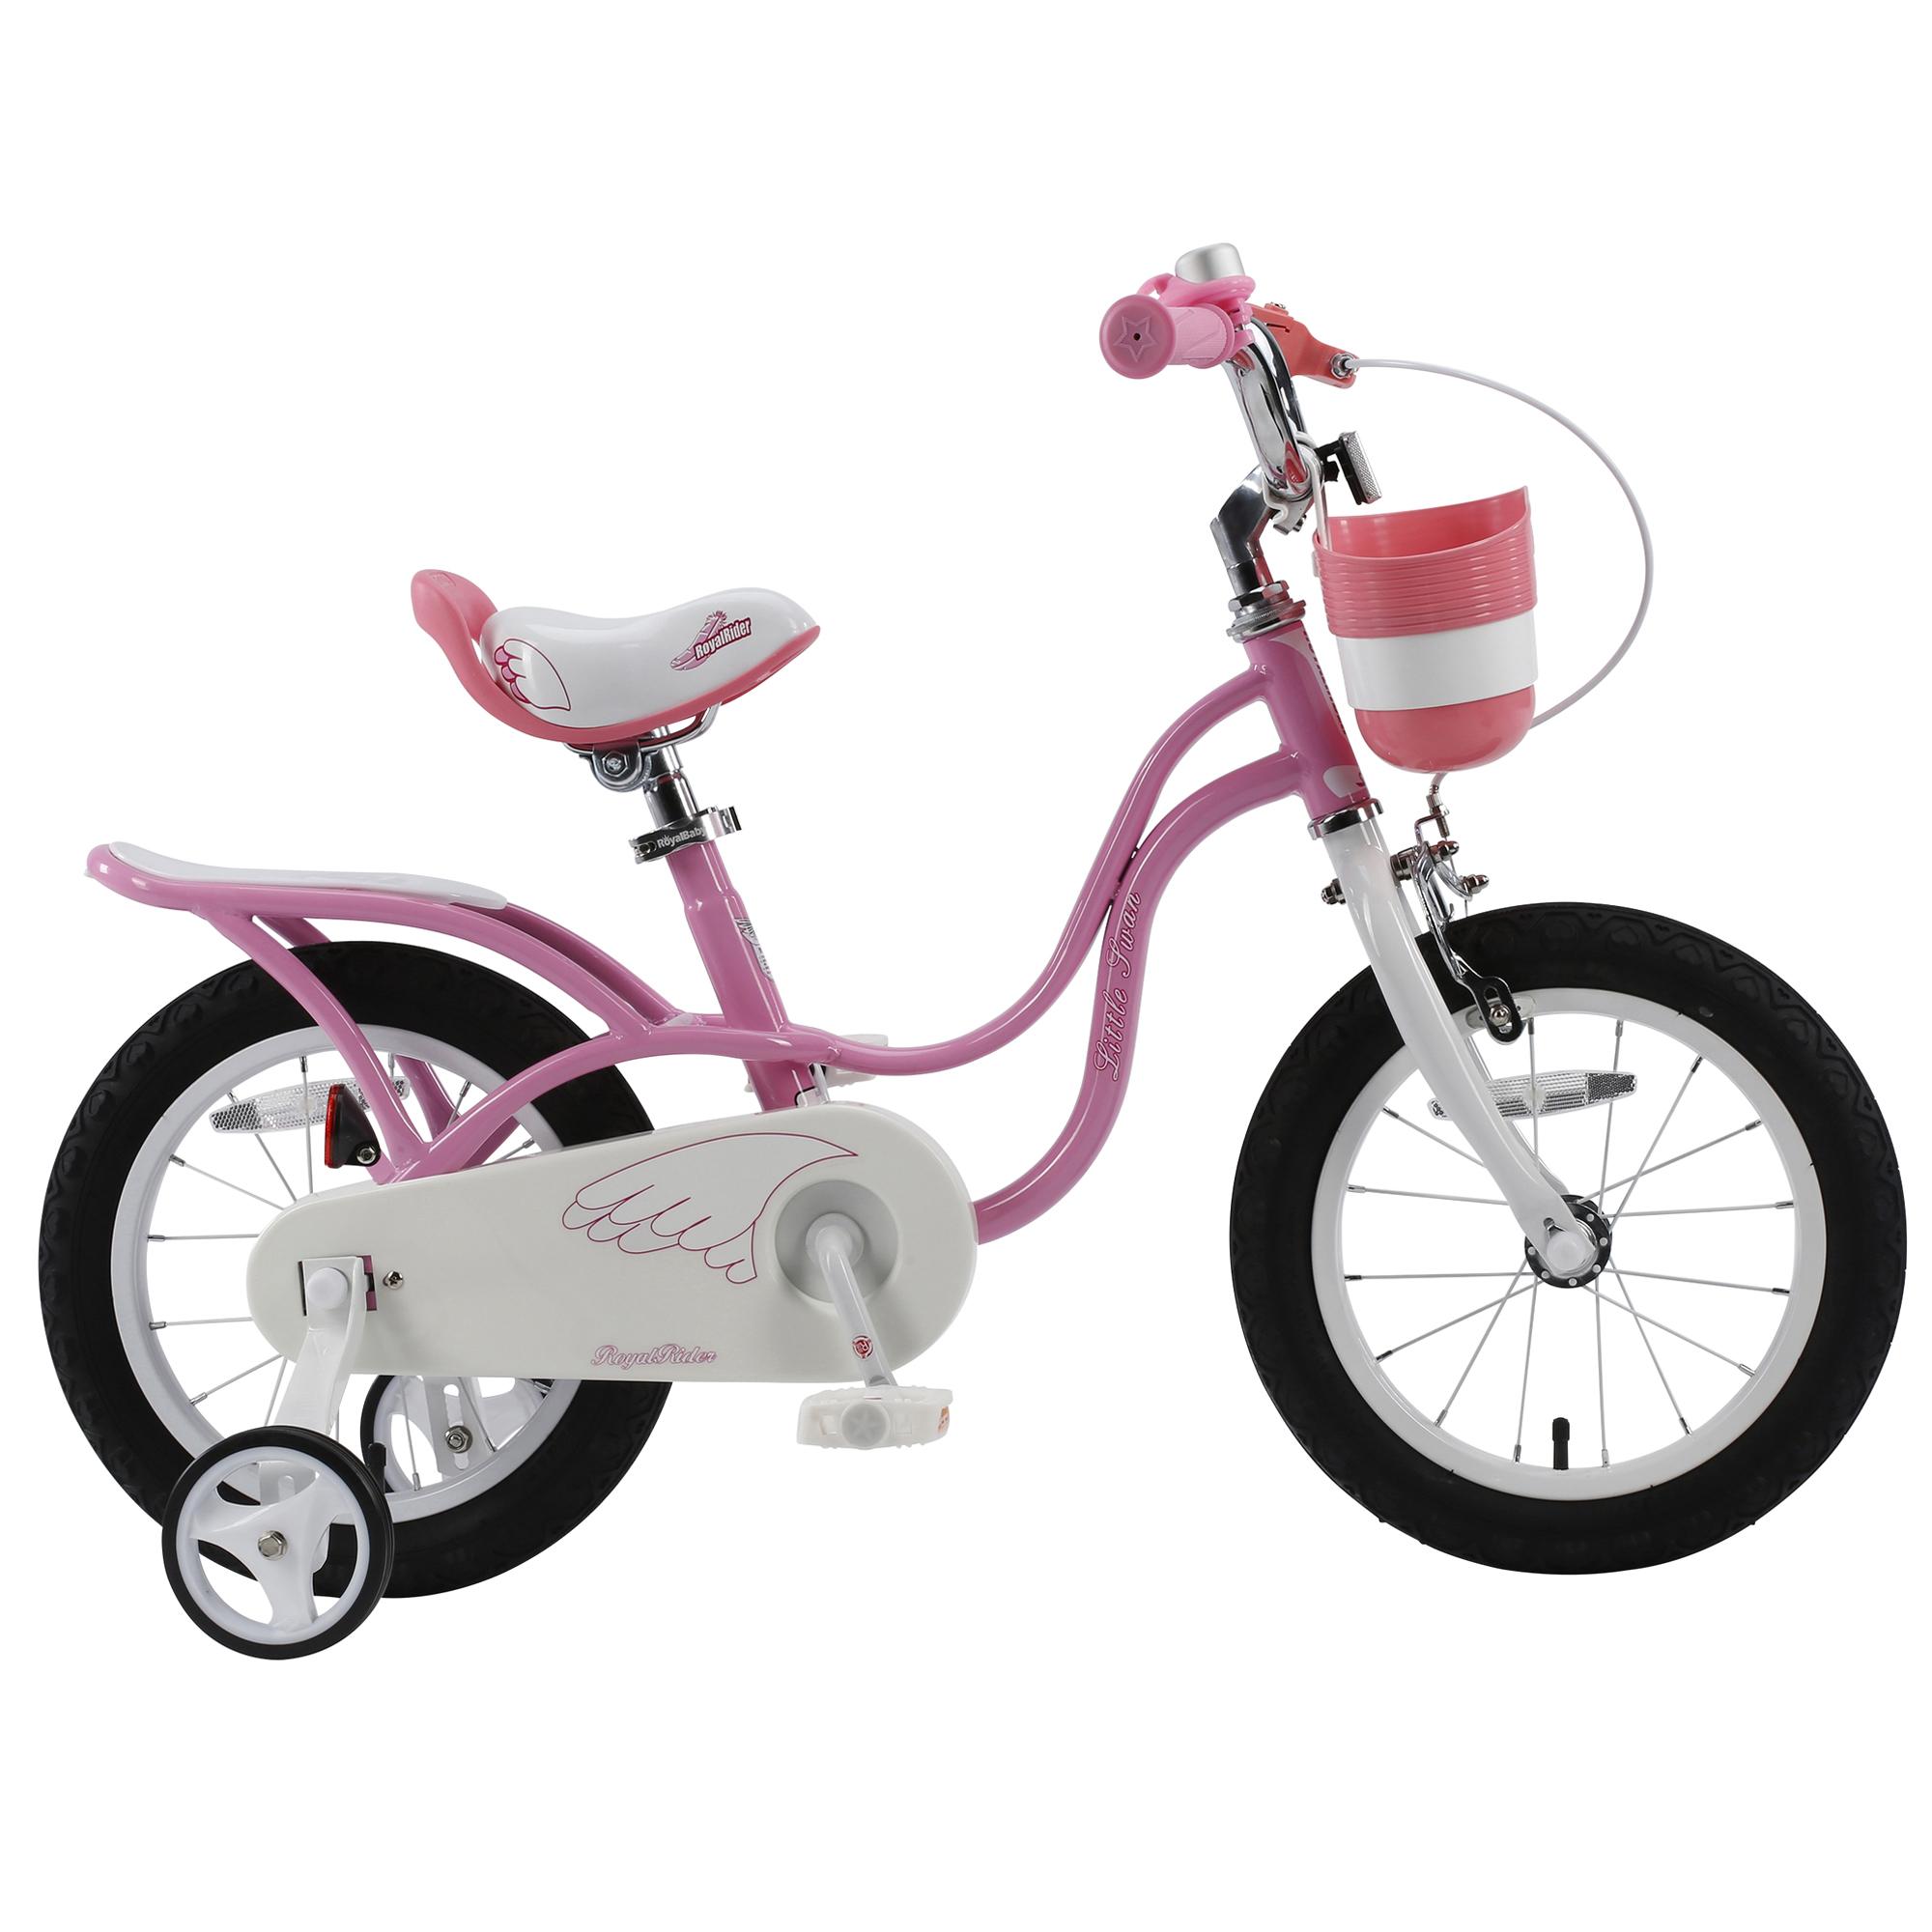 RoyalBaby Little Swan Pink 16 Girl's Bicycle